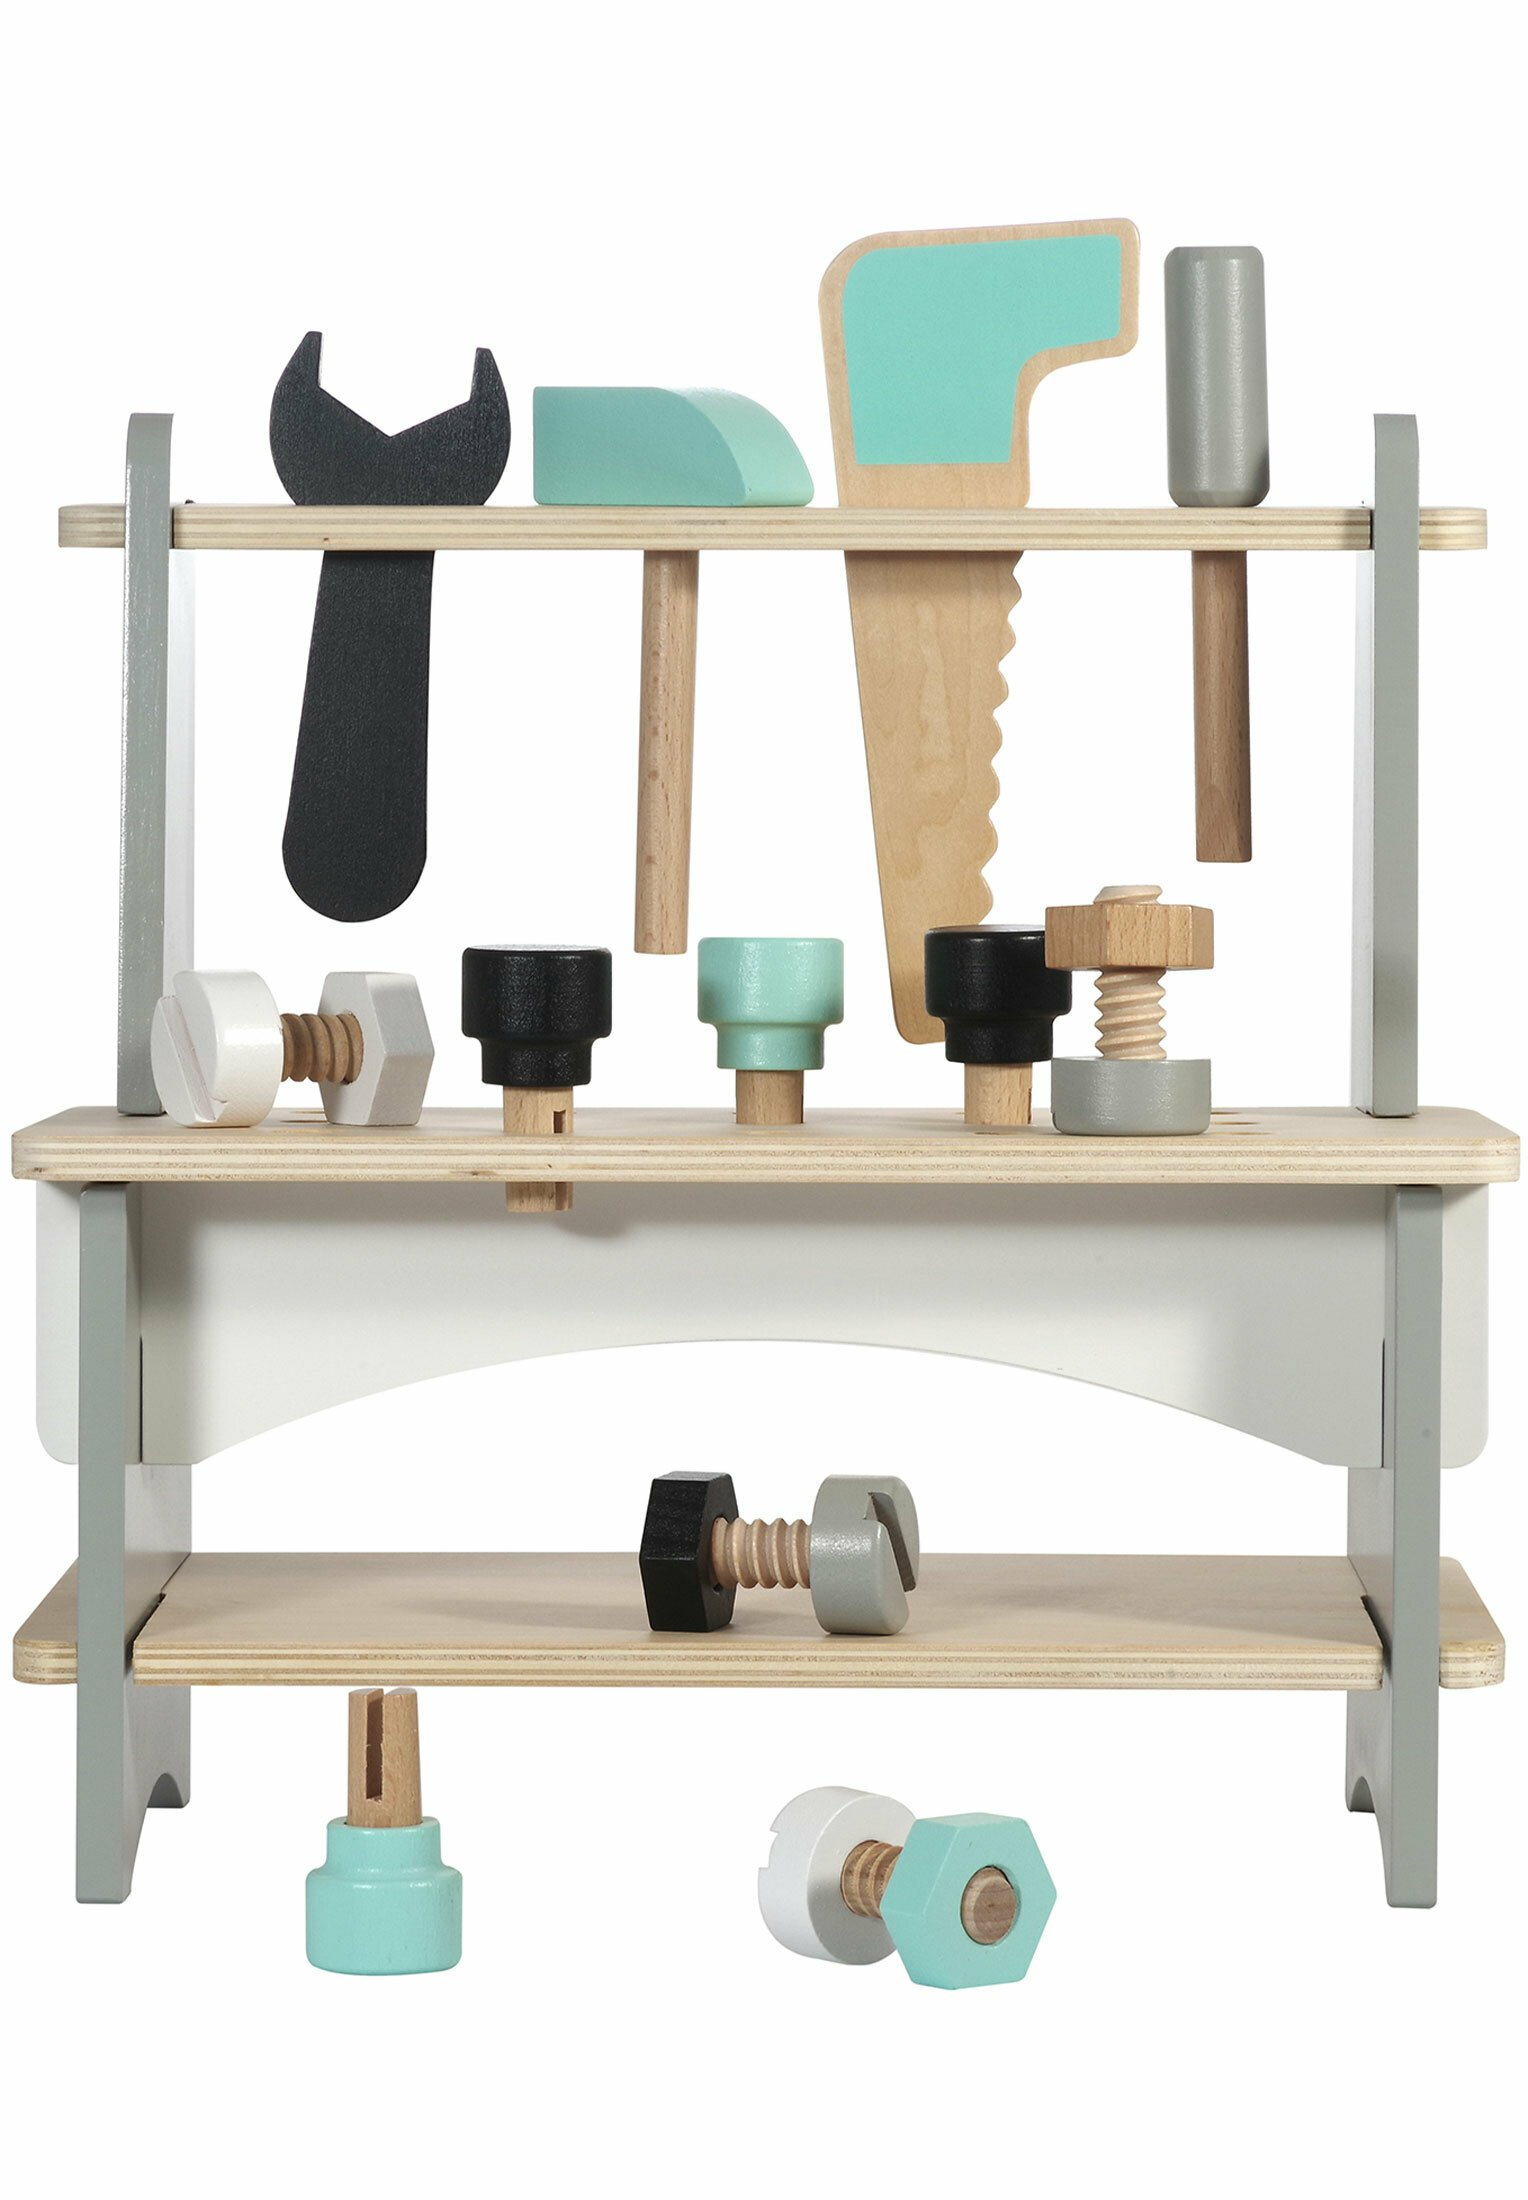 Kinder KINDSGUT WERKBANK - Holzspielzeug